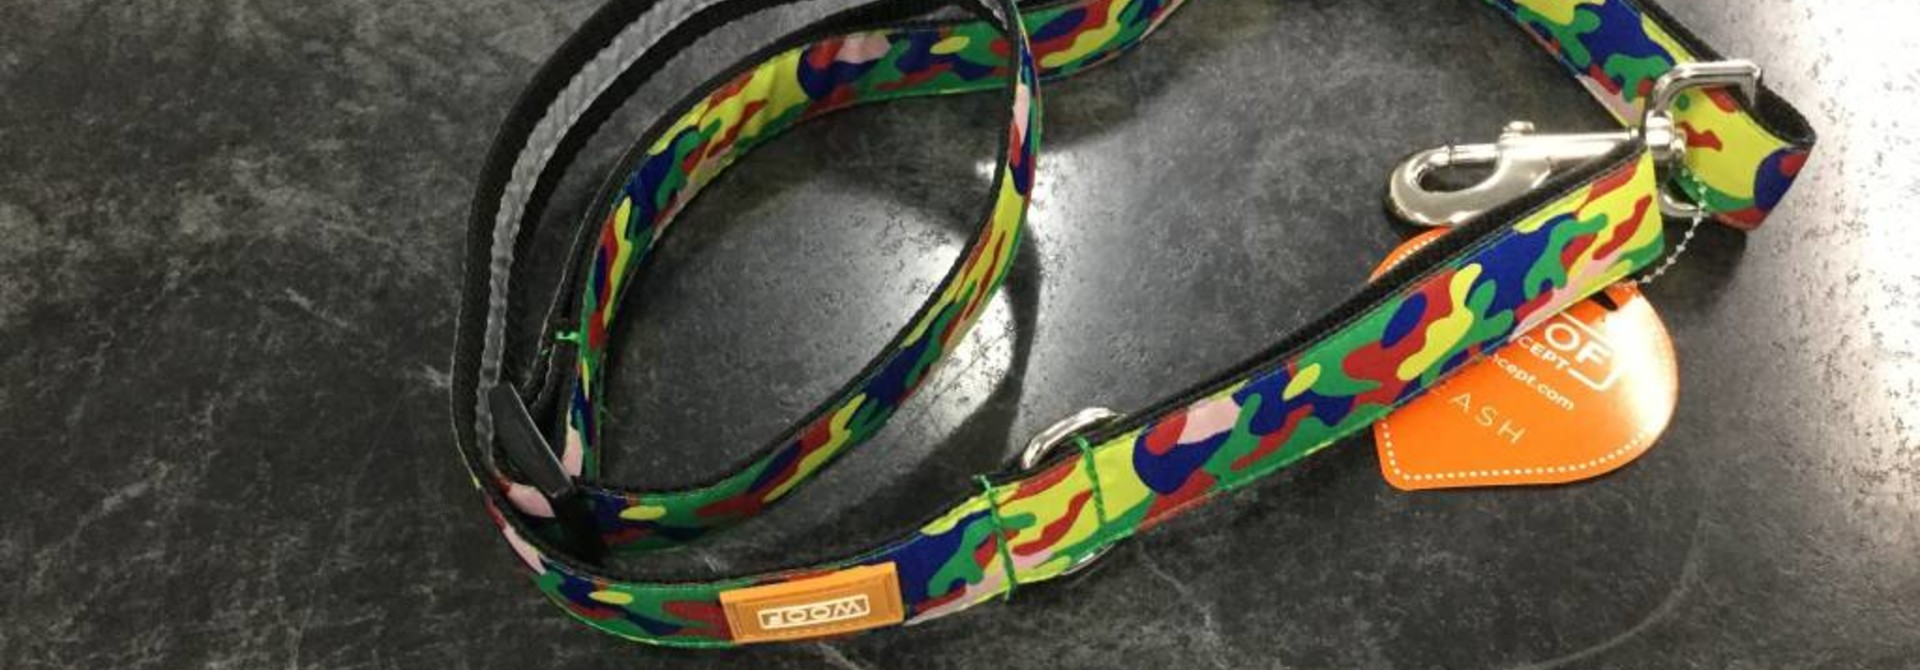 "Woof Concept Leash Rainbow Camo 1"" x 5'"